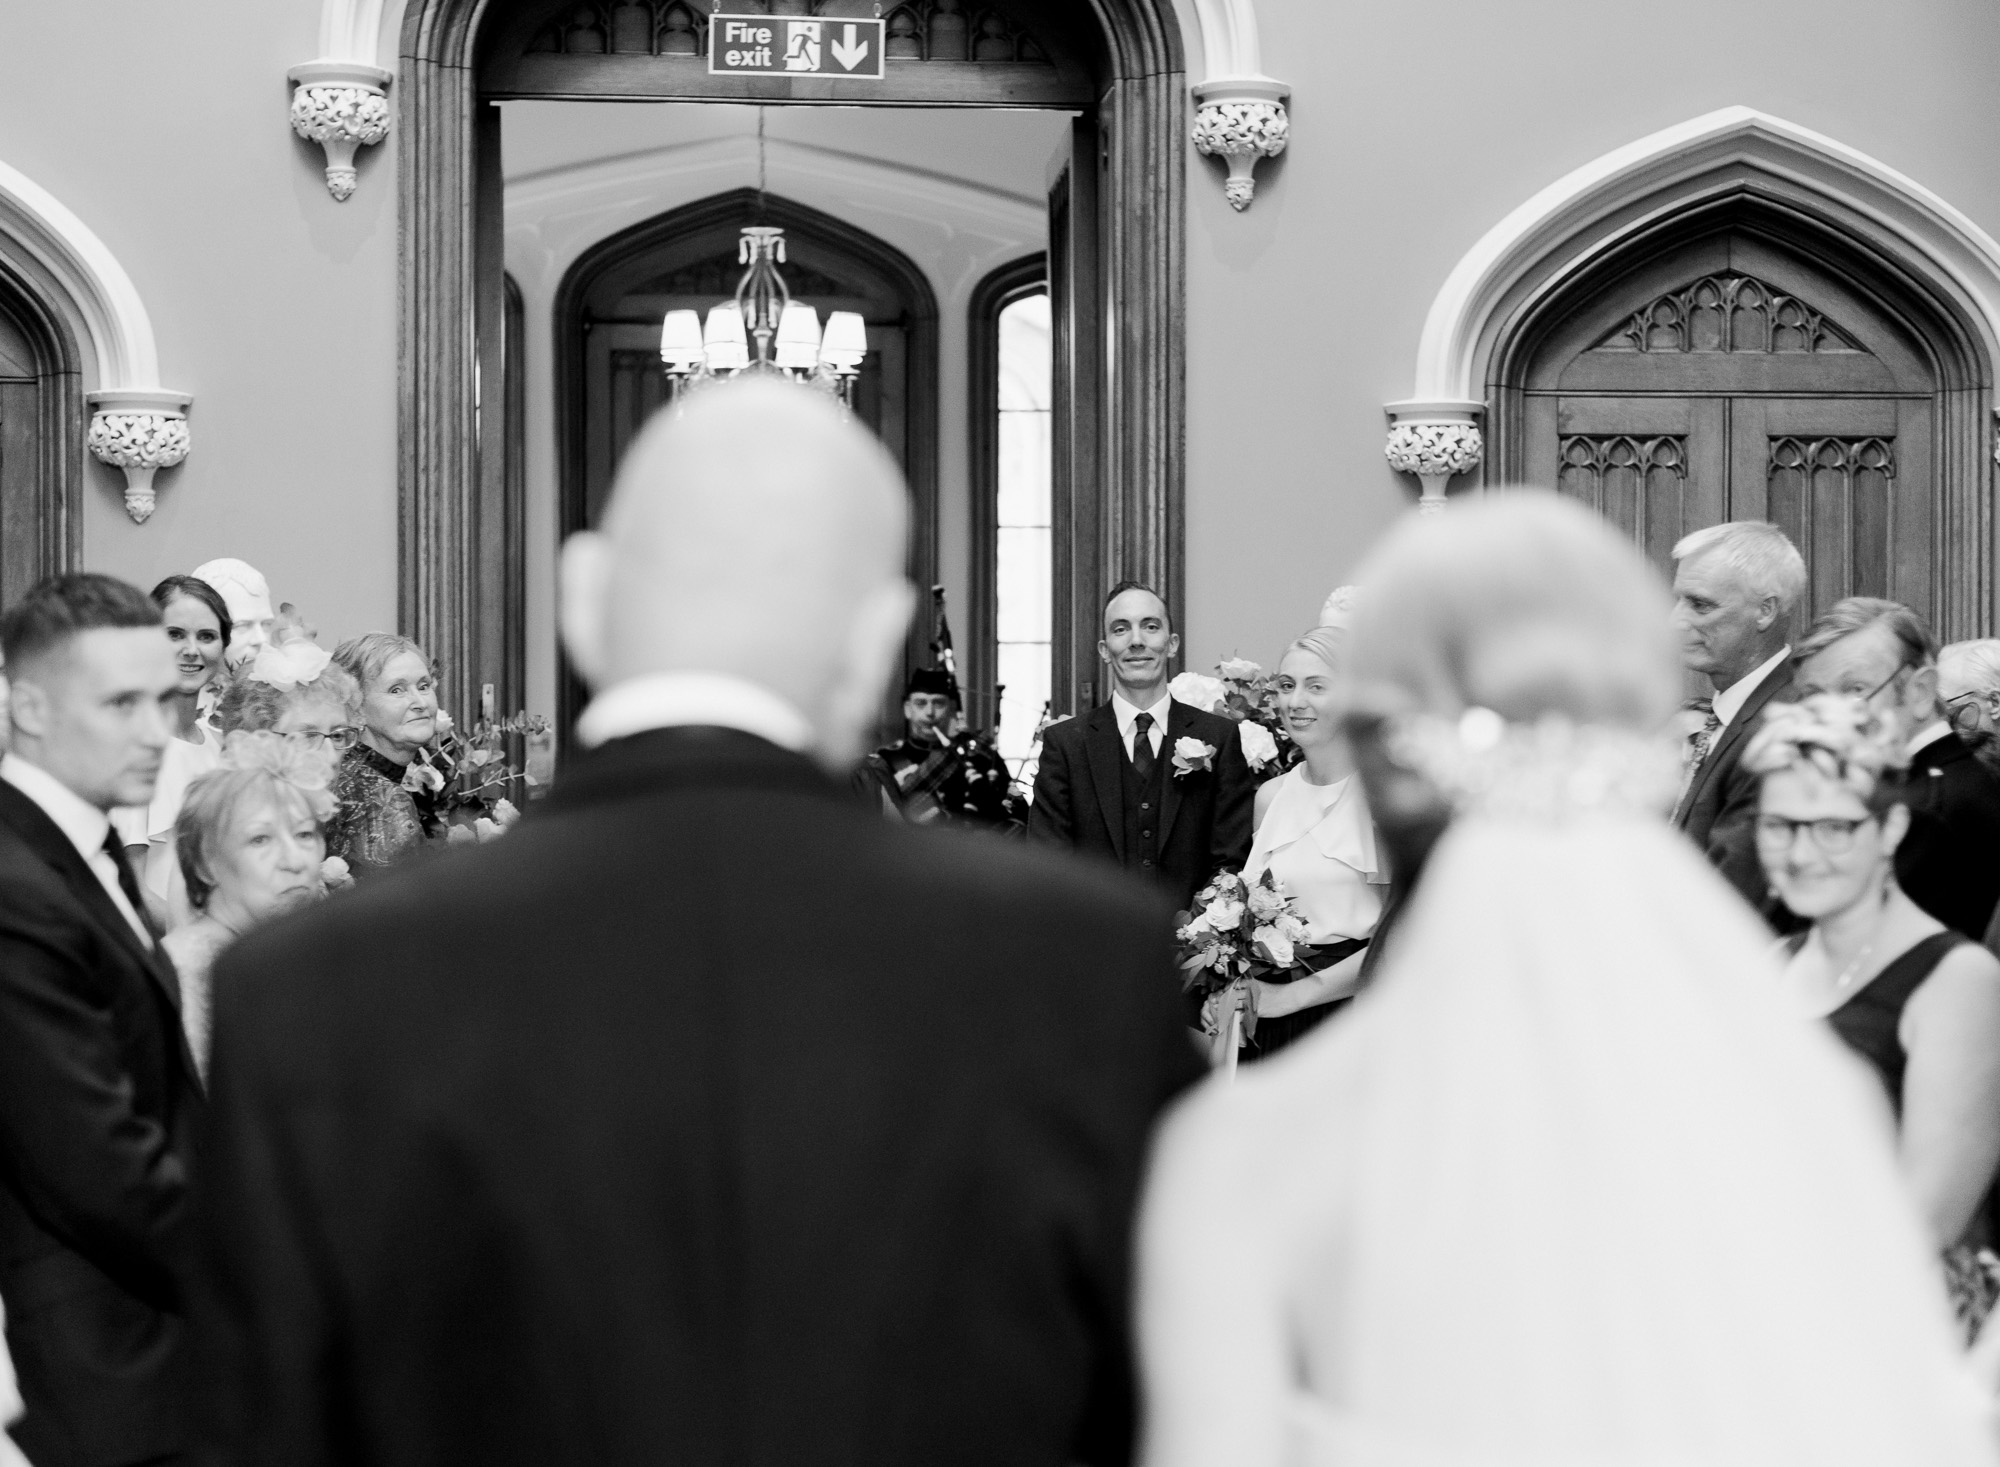 scottish_wedding_blairquhan_castle-64.jpg